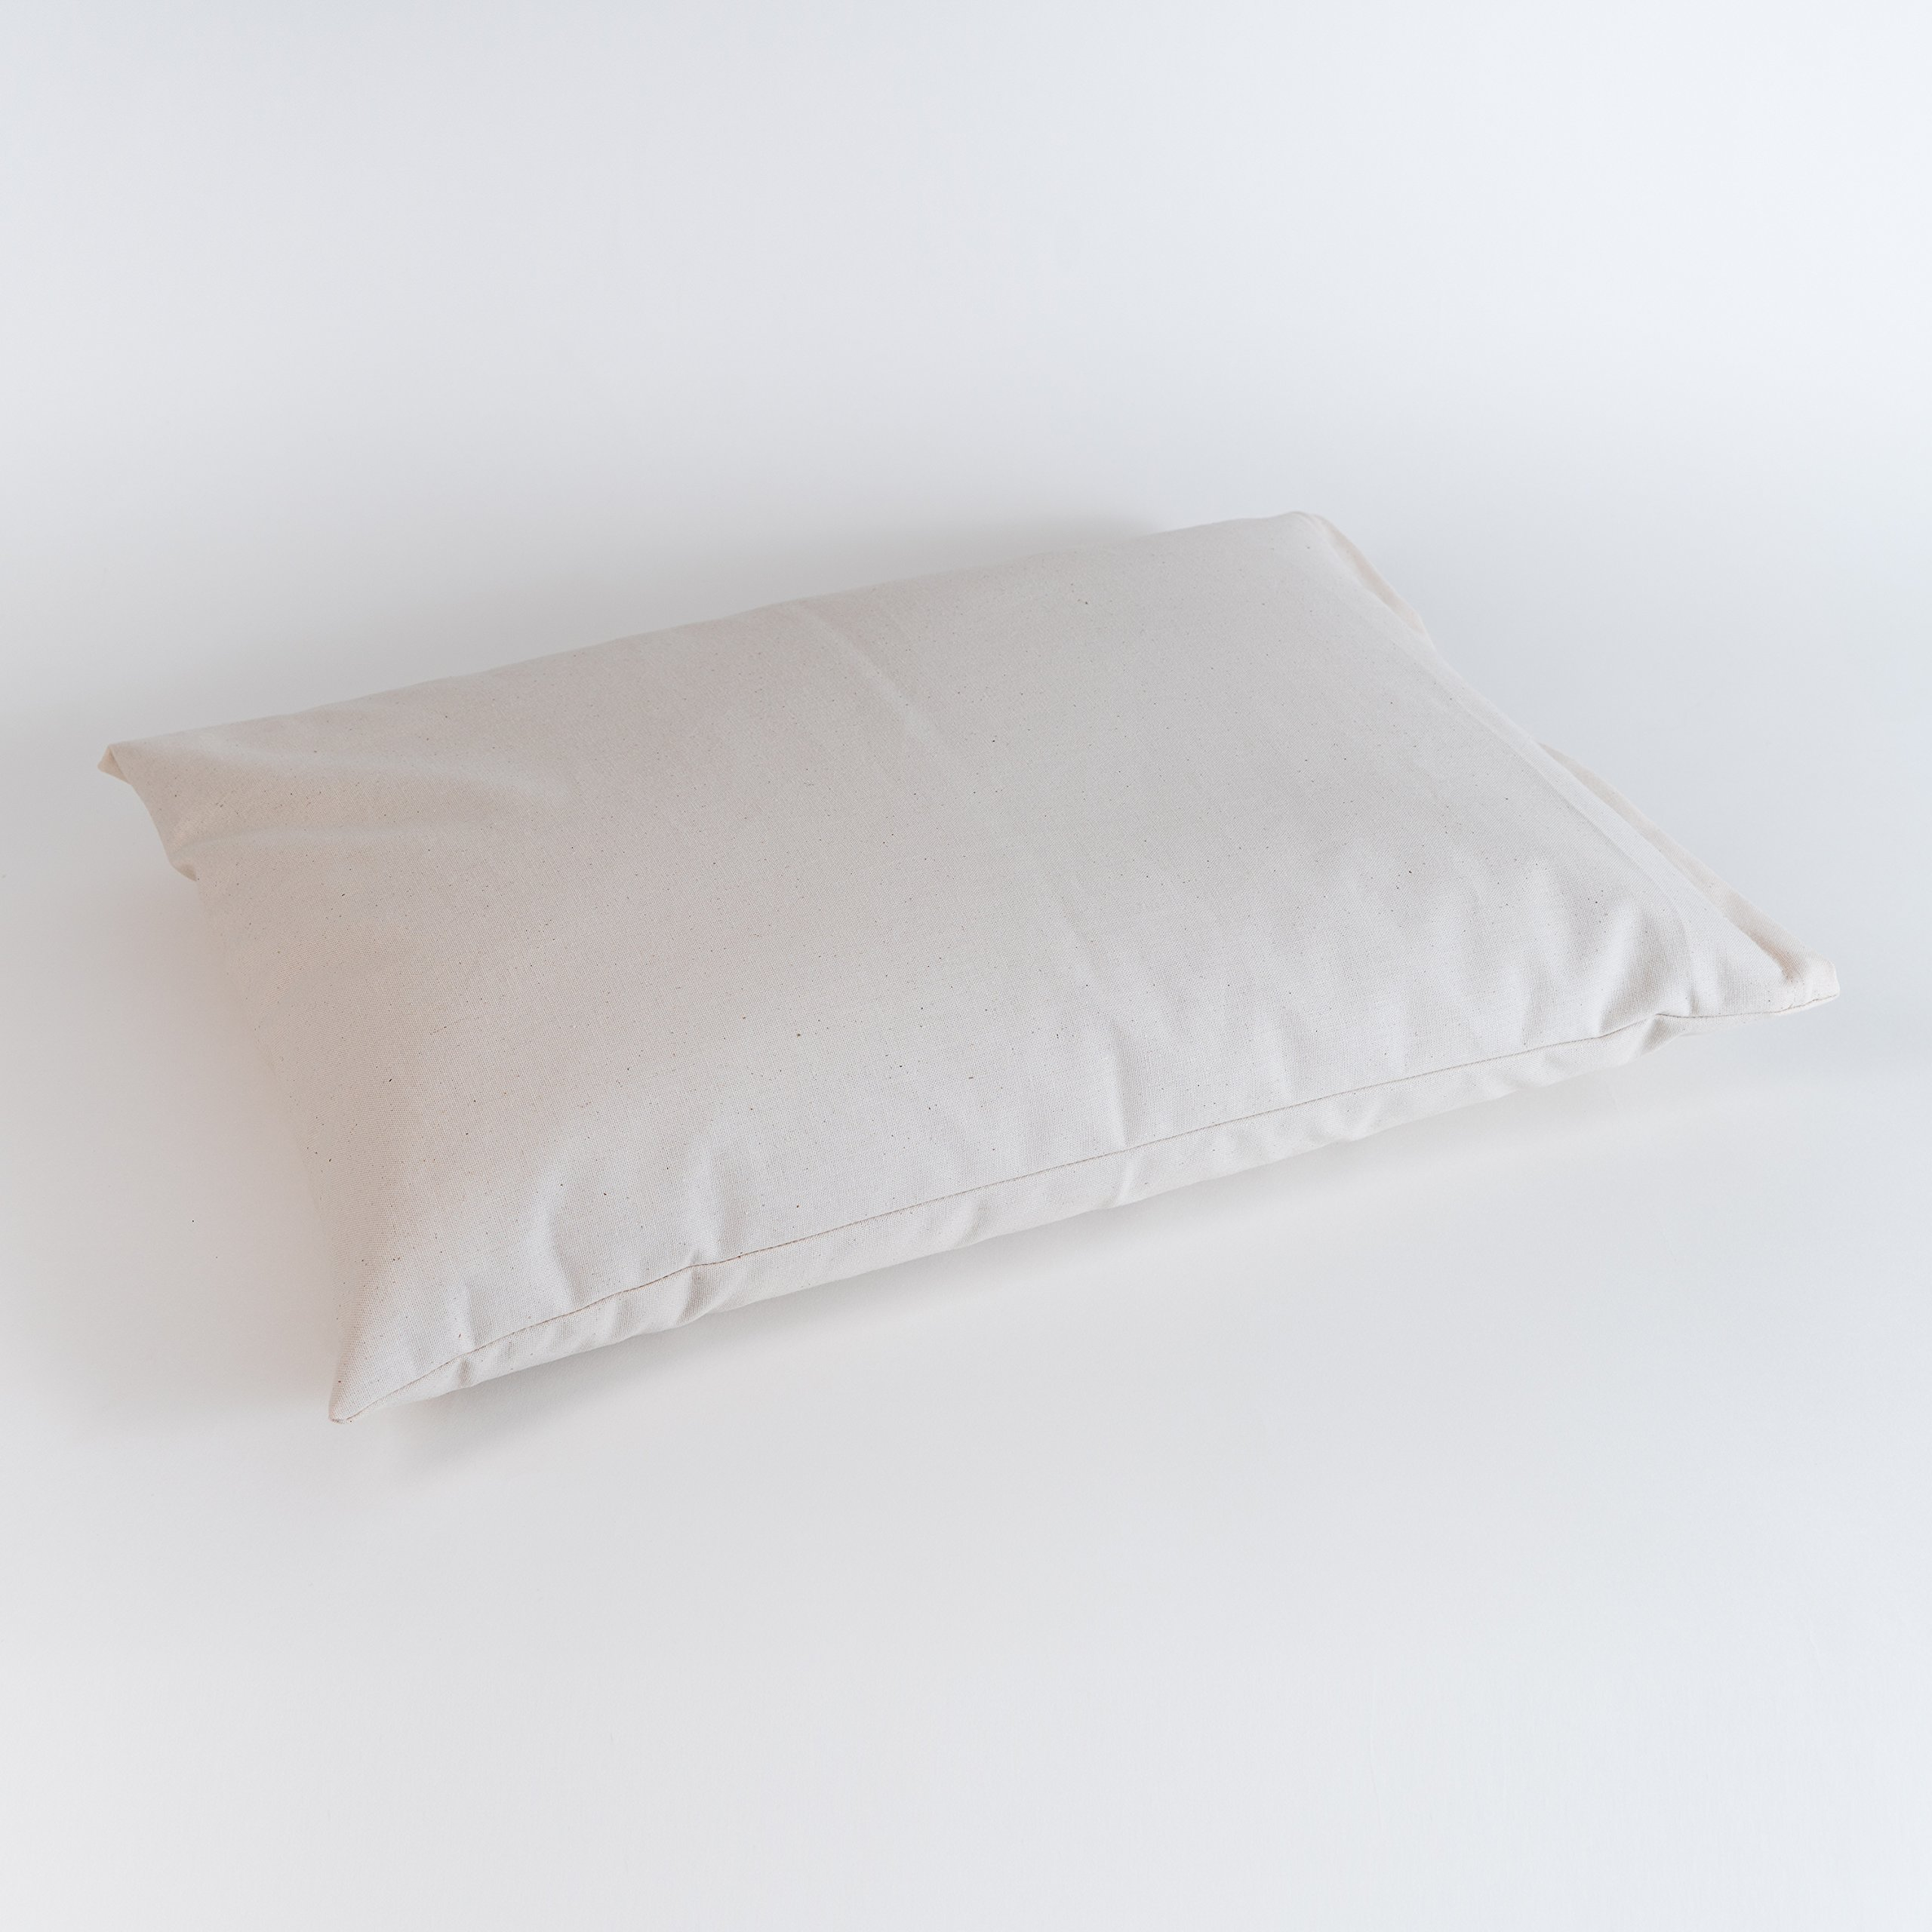 Sachi Organics Buckwheat Hull Sleeping Pillow